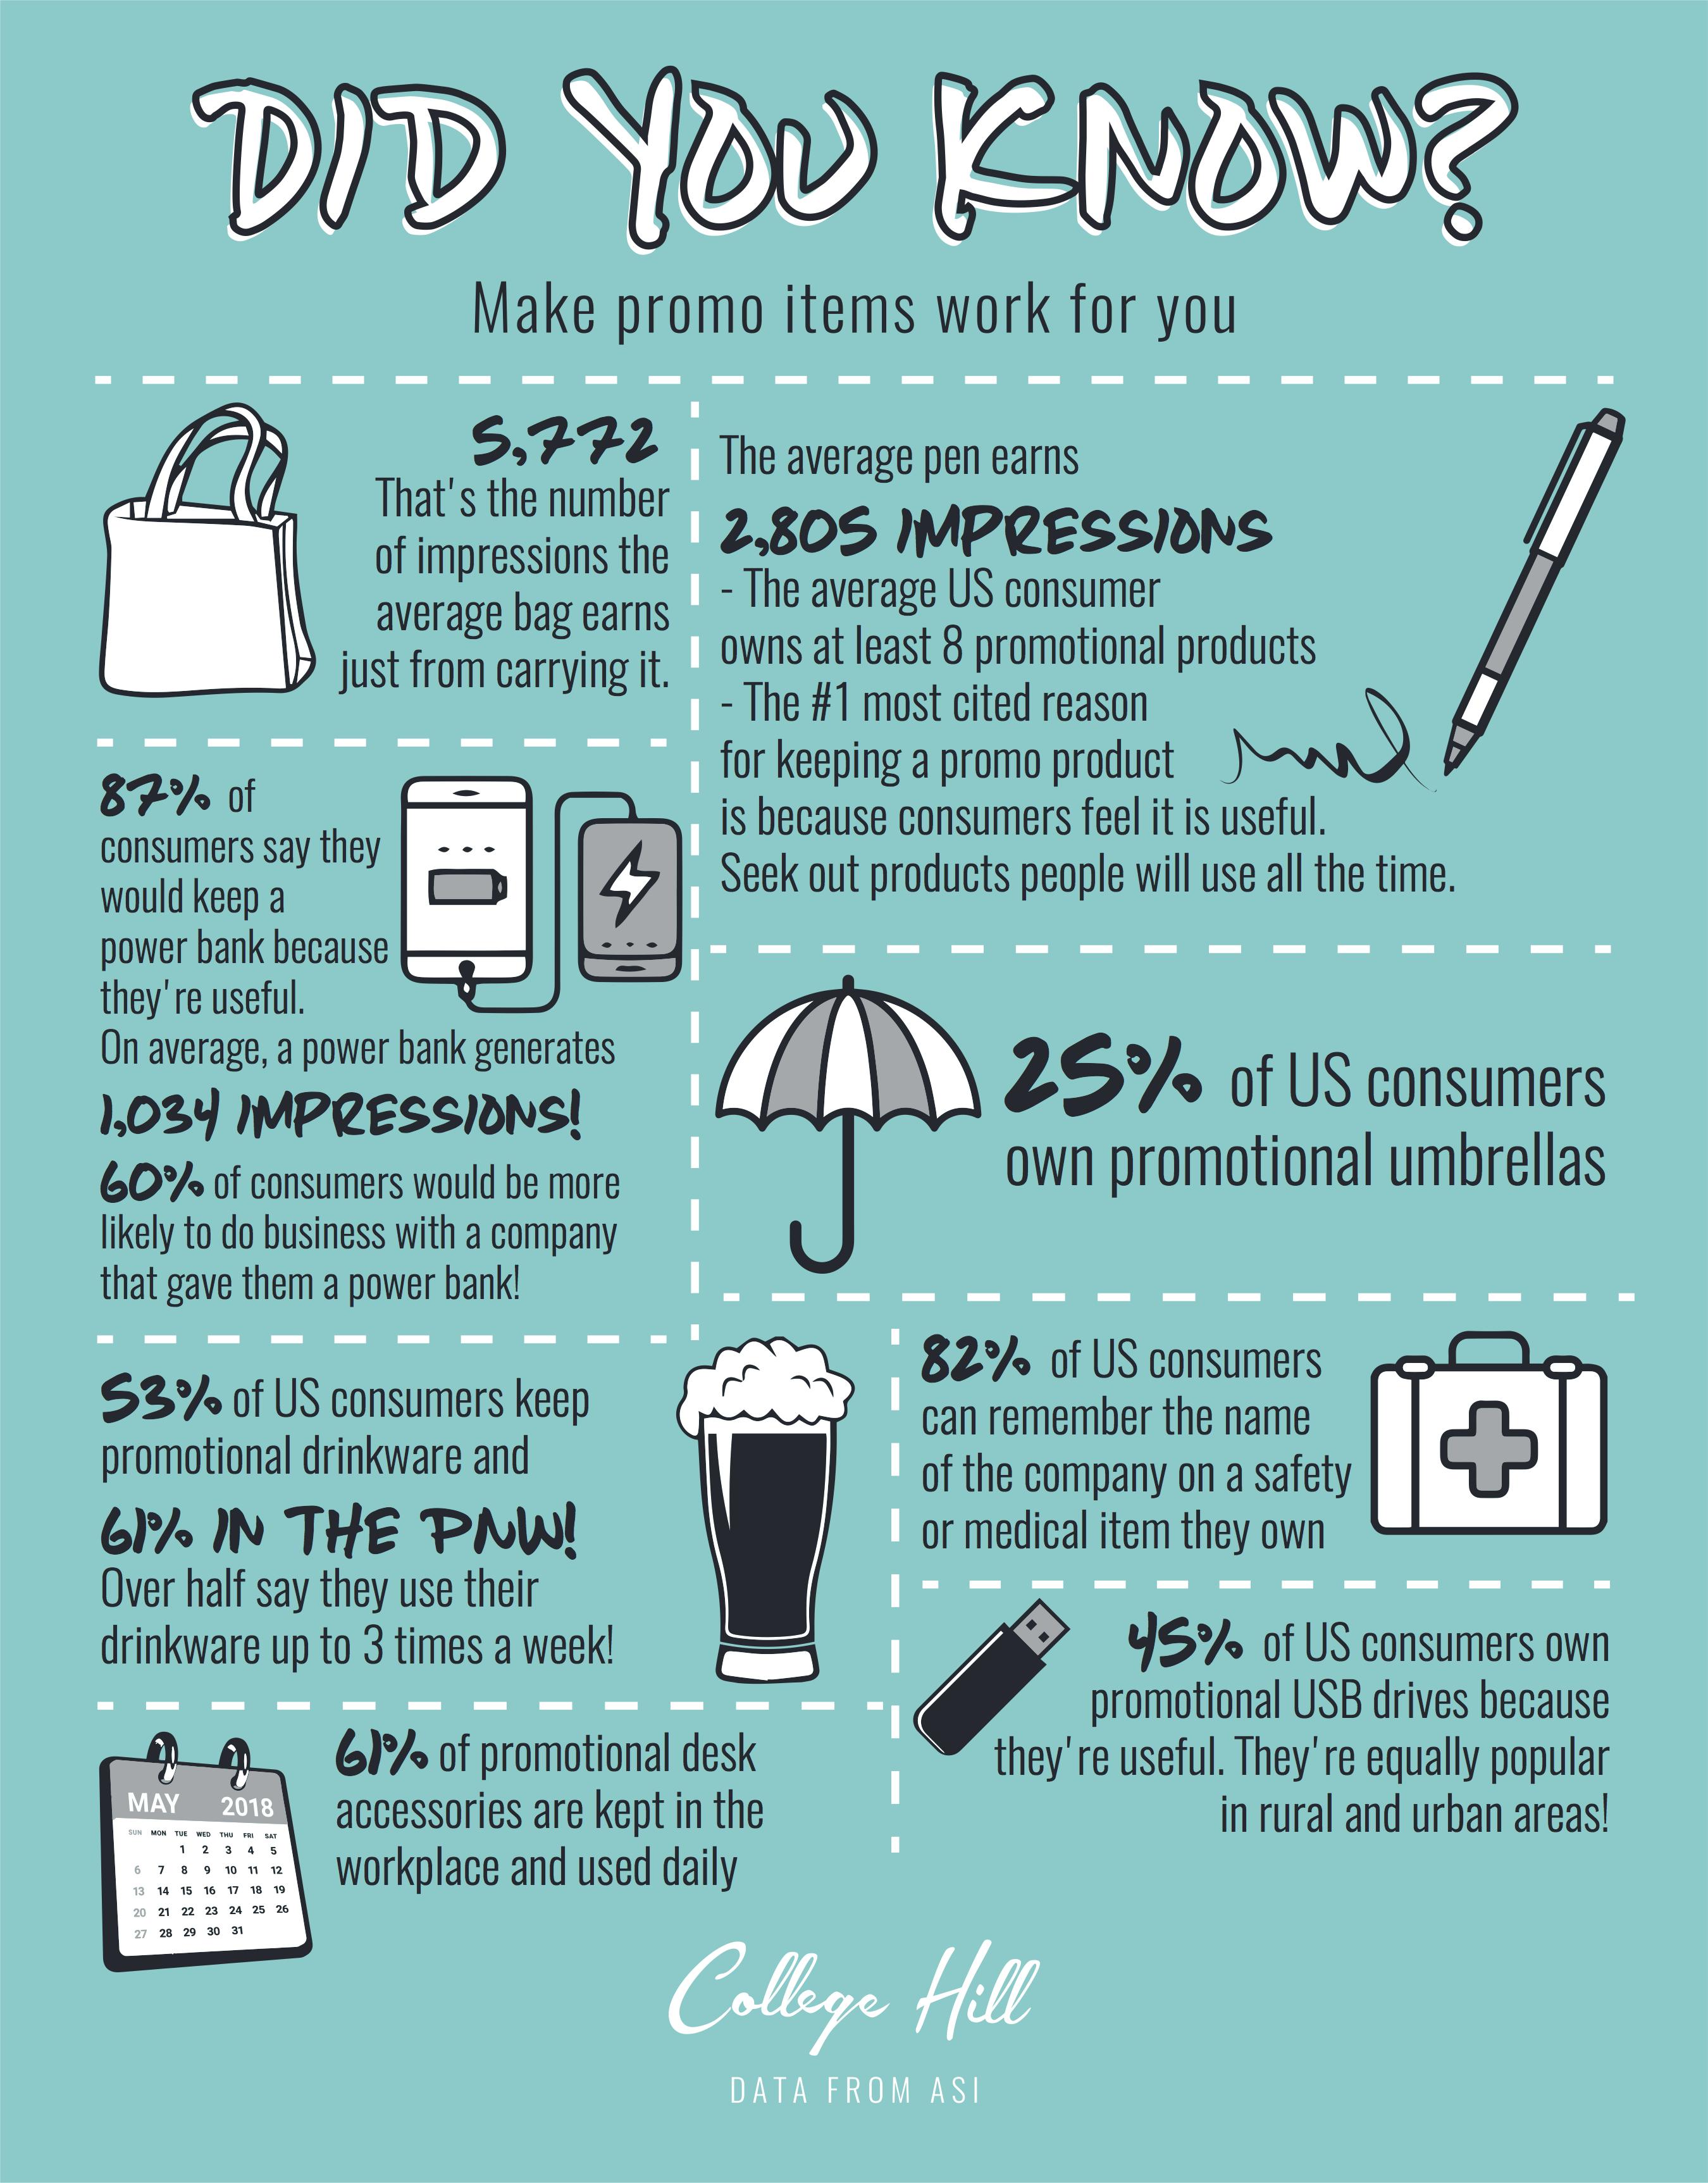 College Hill Marketing 2019 - Promo Infographic 2